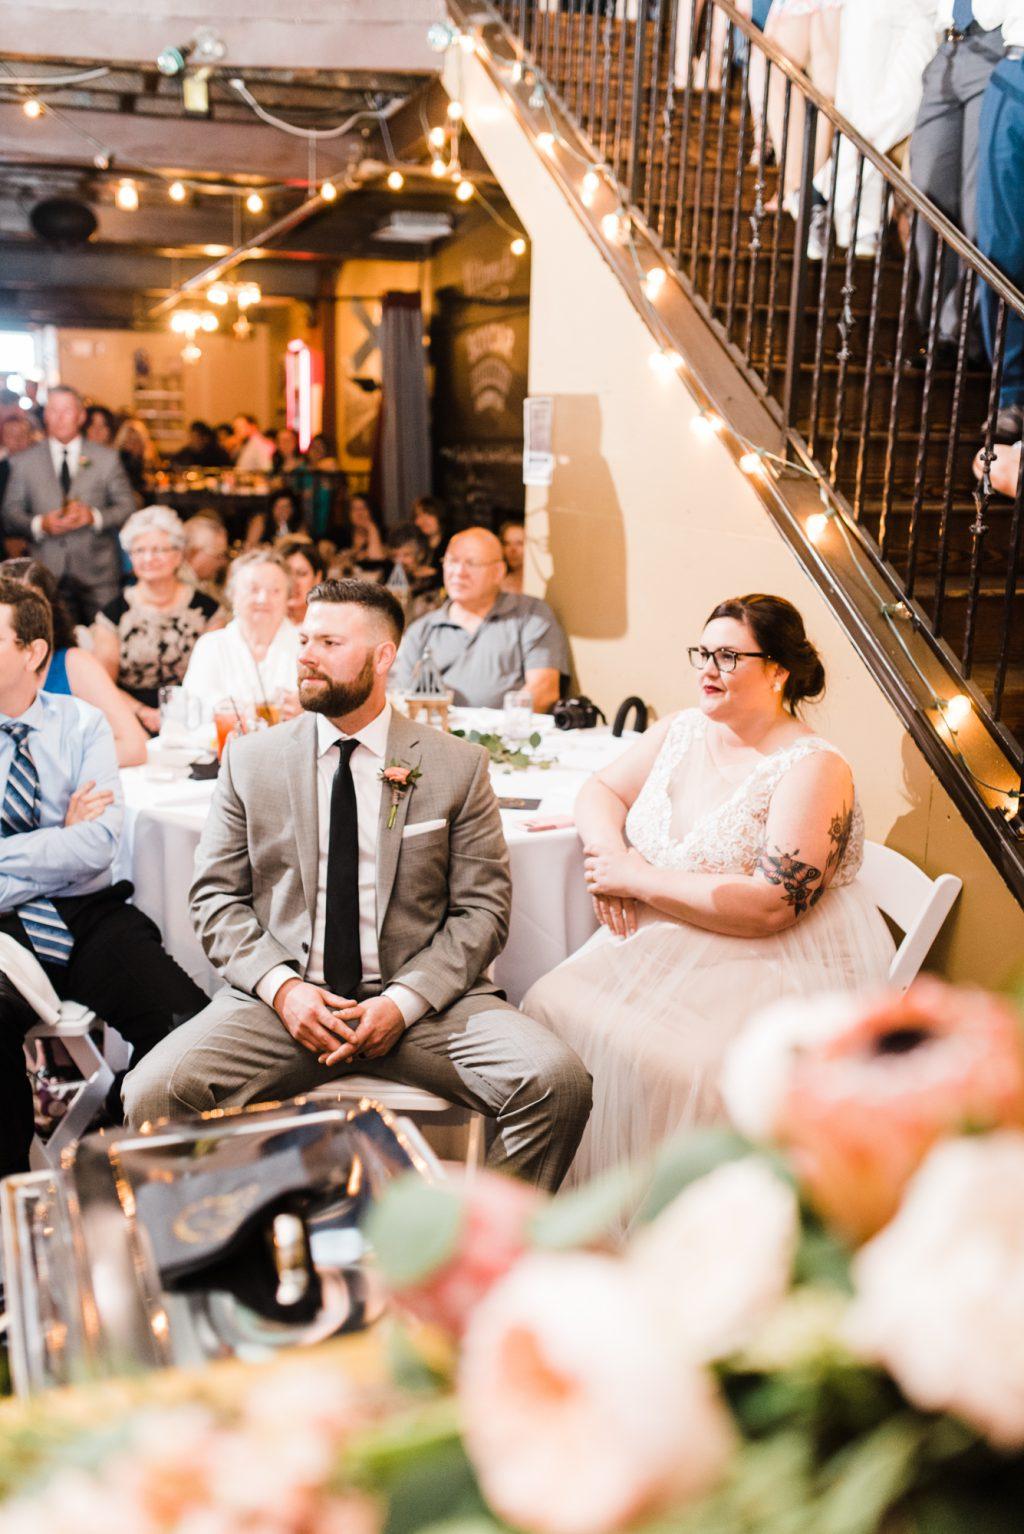 haley-richter-photo-west-chester-summer-wedding-boxcar-brewery-170